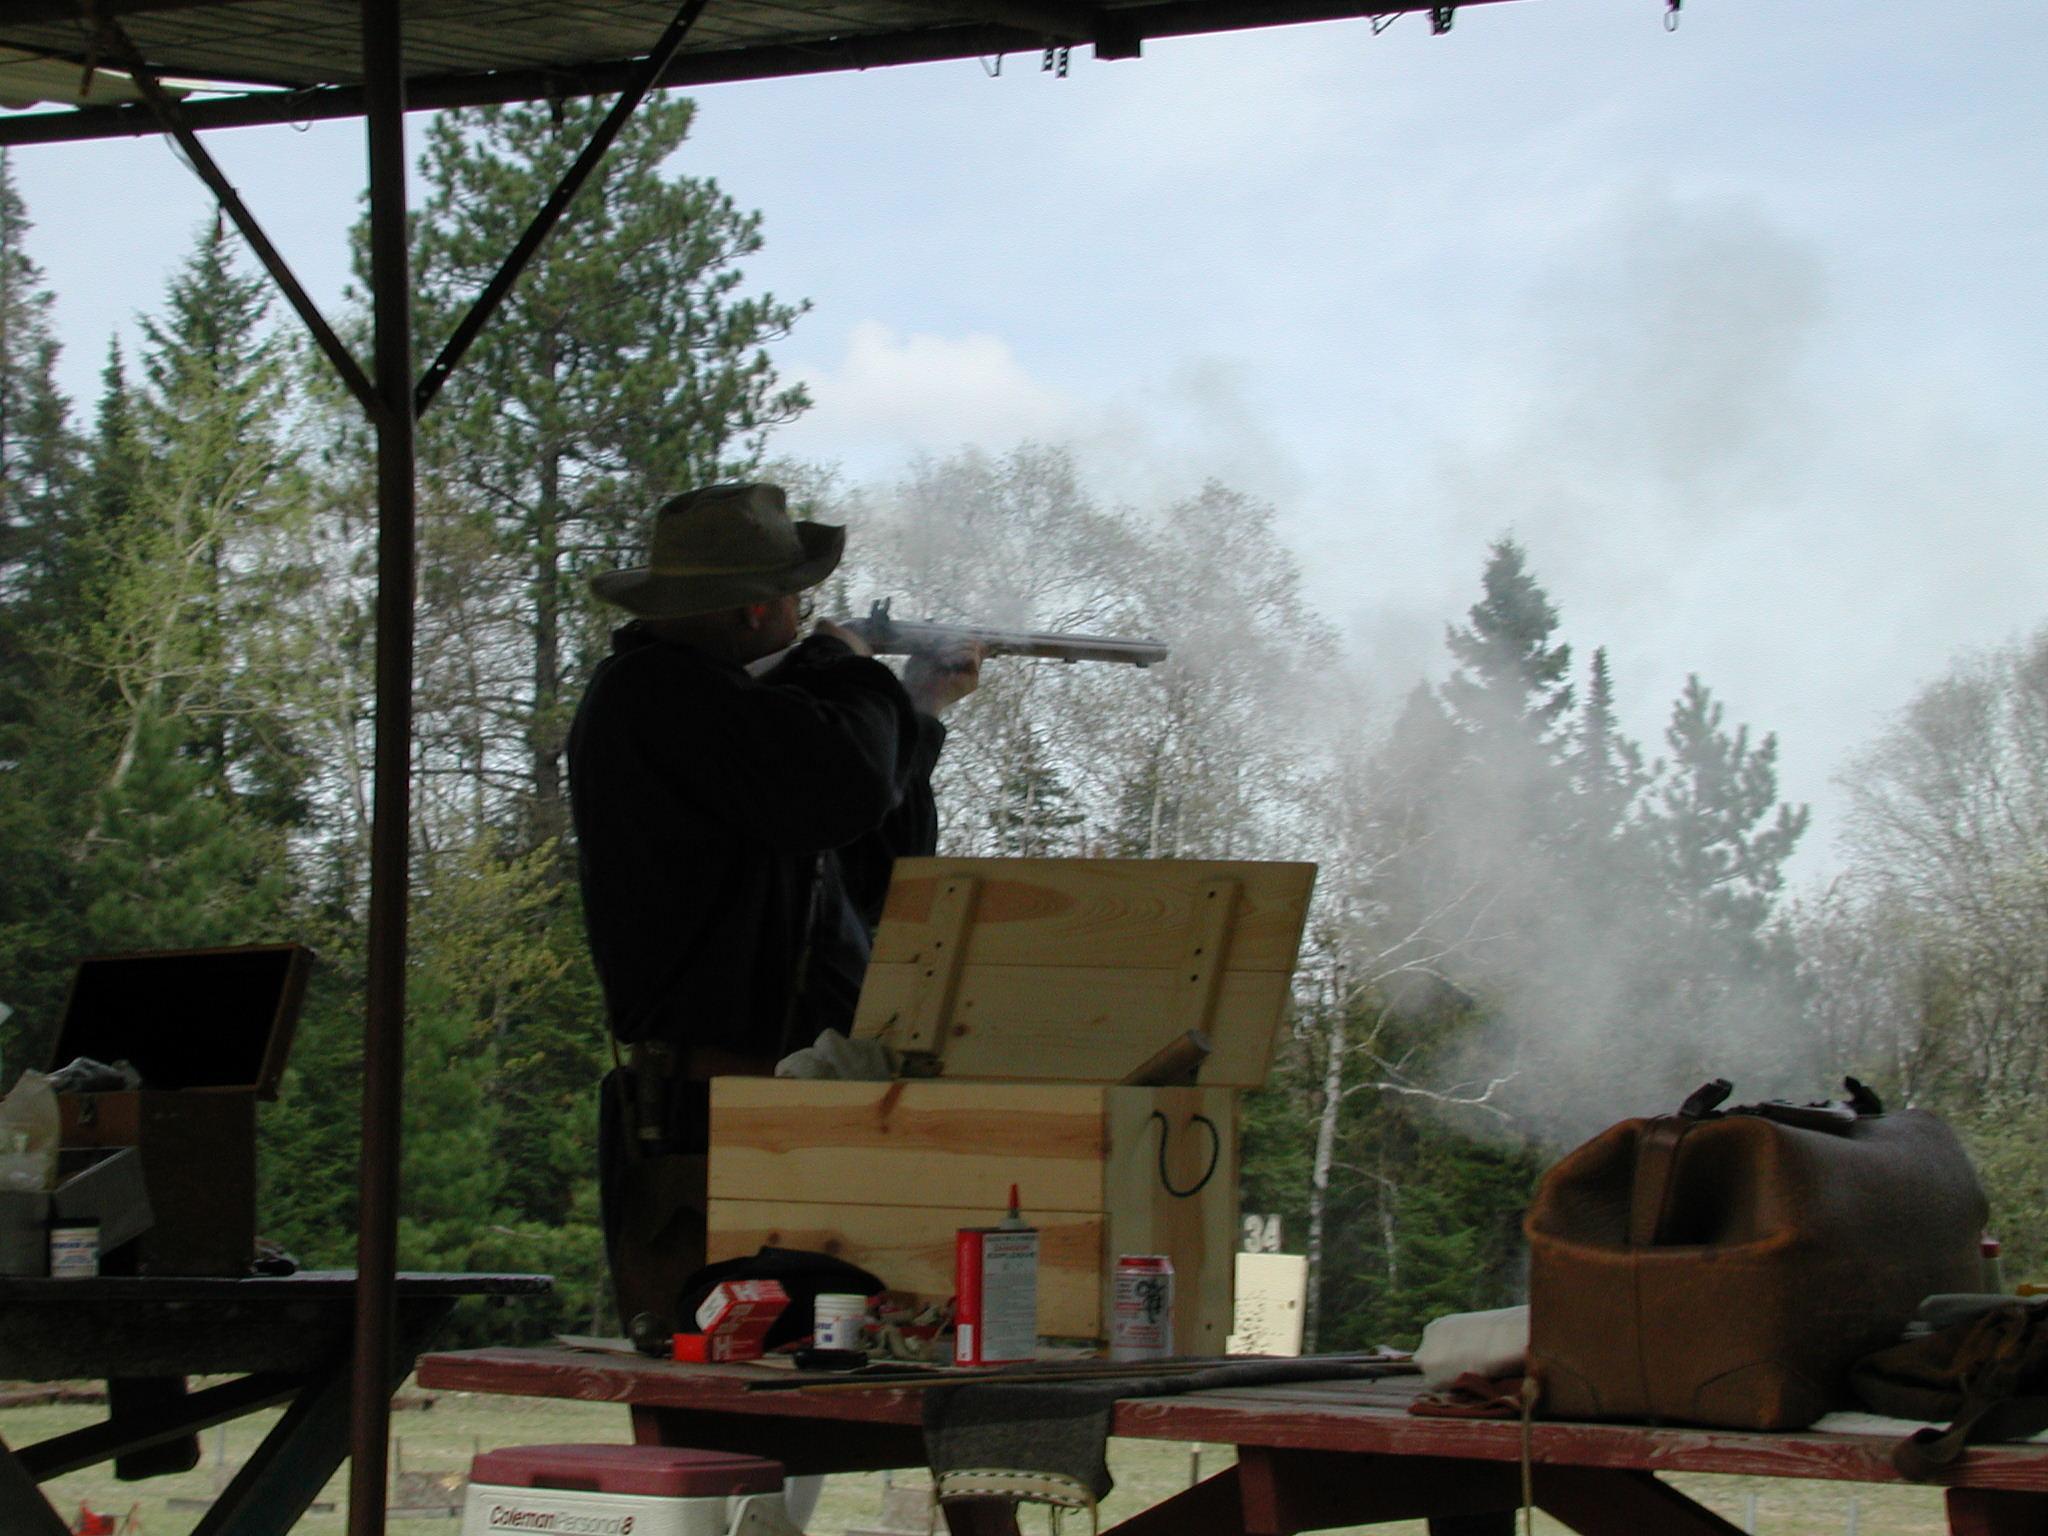 Squinty-eye Black powder shoot by wes.johnson.58